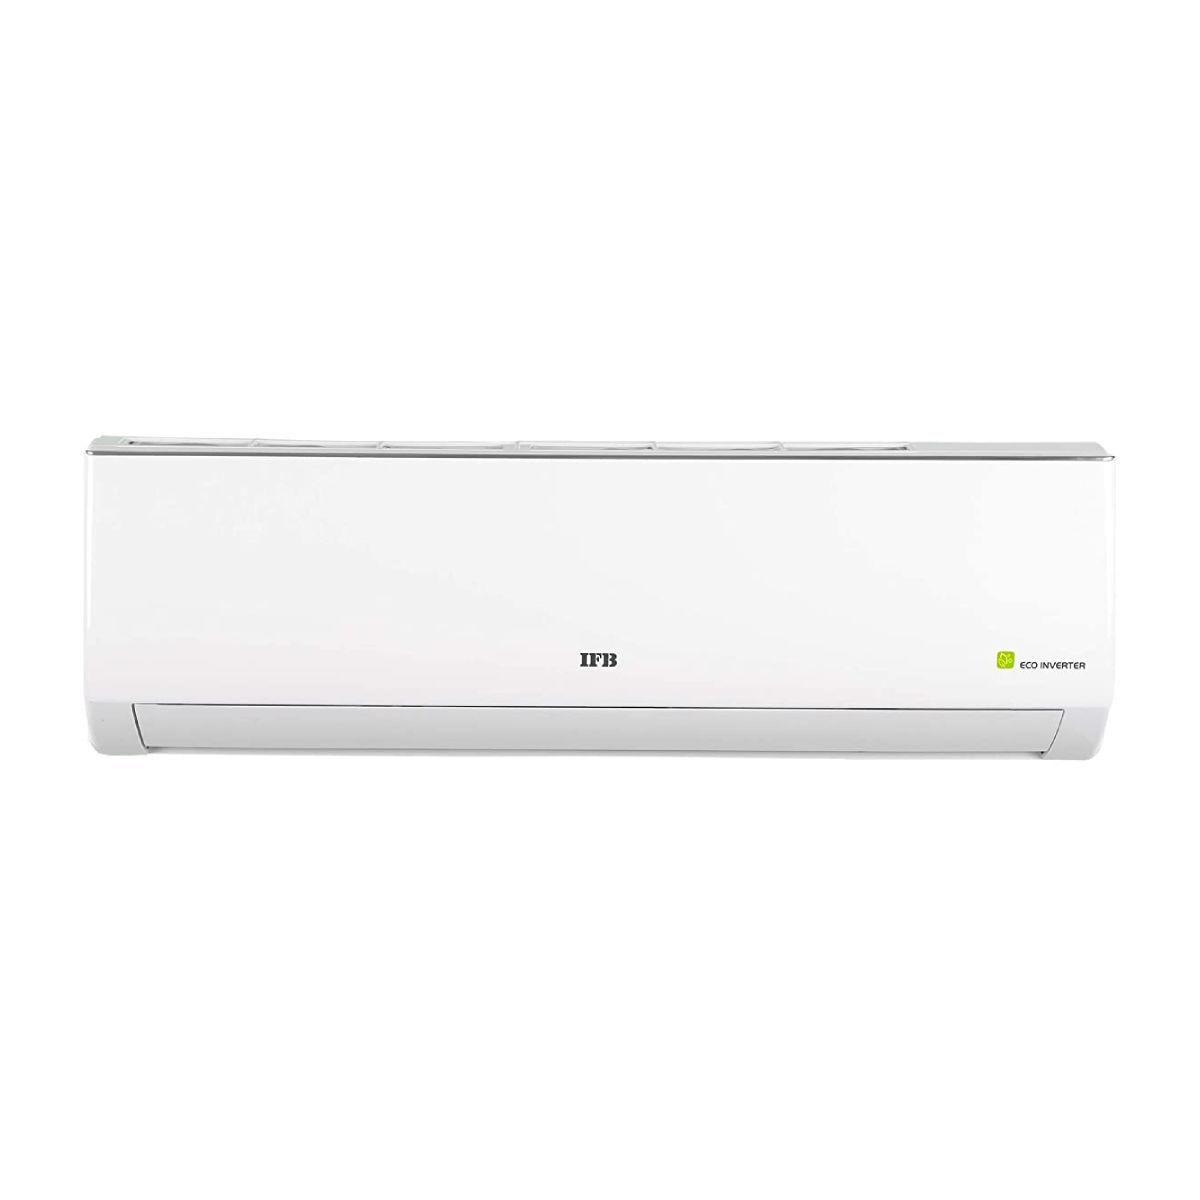 आई.एफ.बी. IACI18X95T3C 1.5 Ton 5 Star Inverter Split Air Conditioner